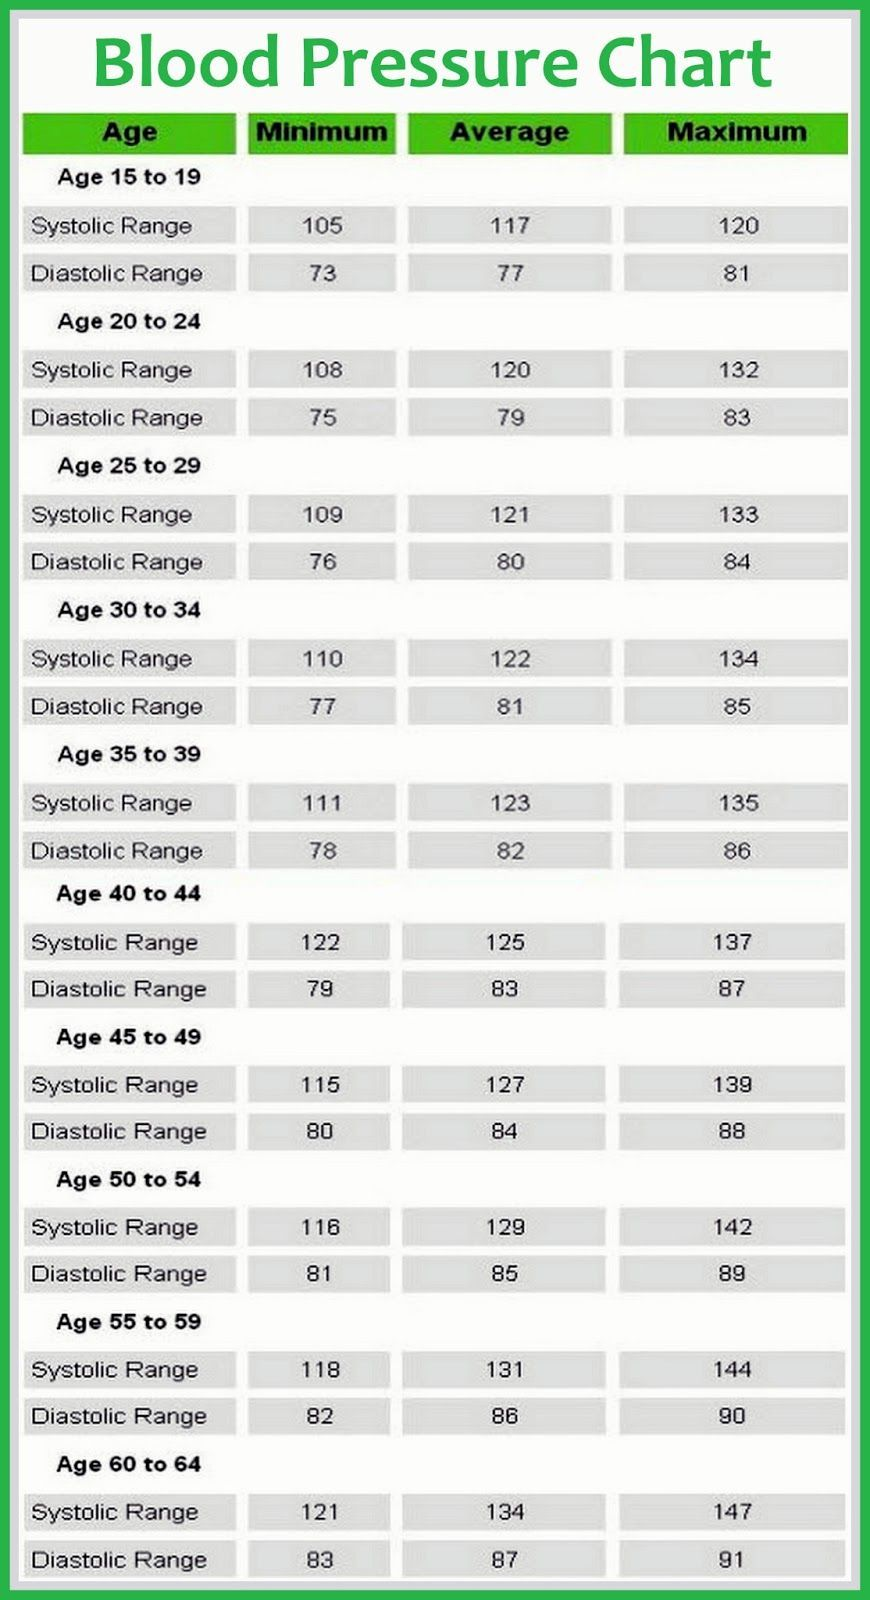 Blood pressure chart health tips in pics charts pinterest blood pressure chart health tips in pics geenschuldenfo Images